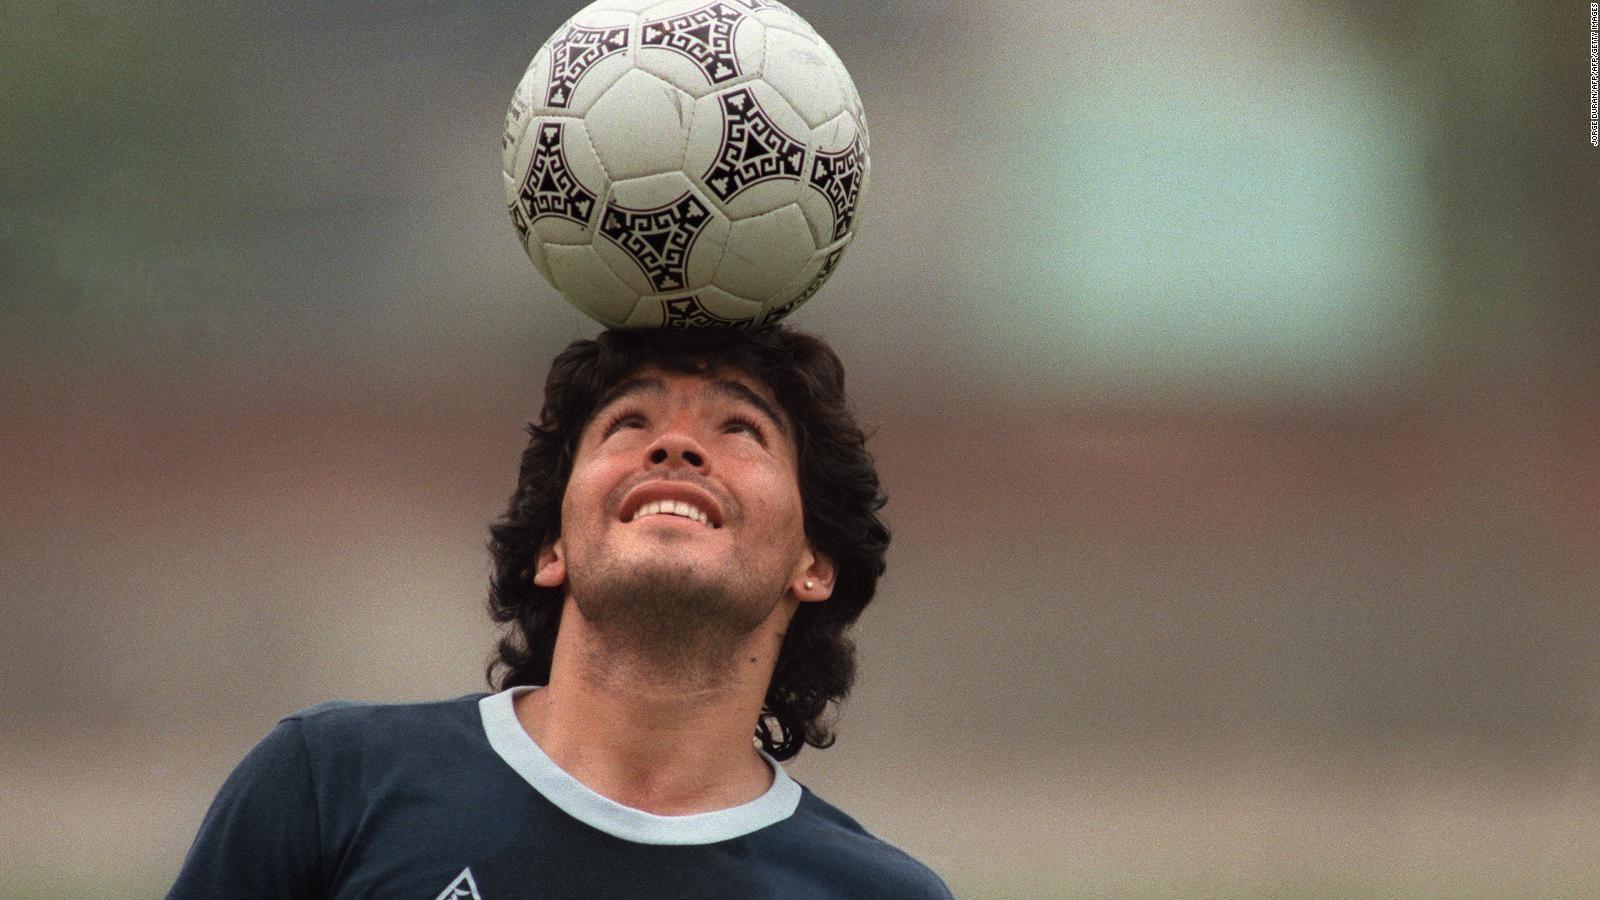 Presidente de la FIFA expresa pesar por la muerte de Diego Maradona